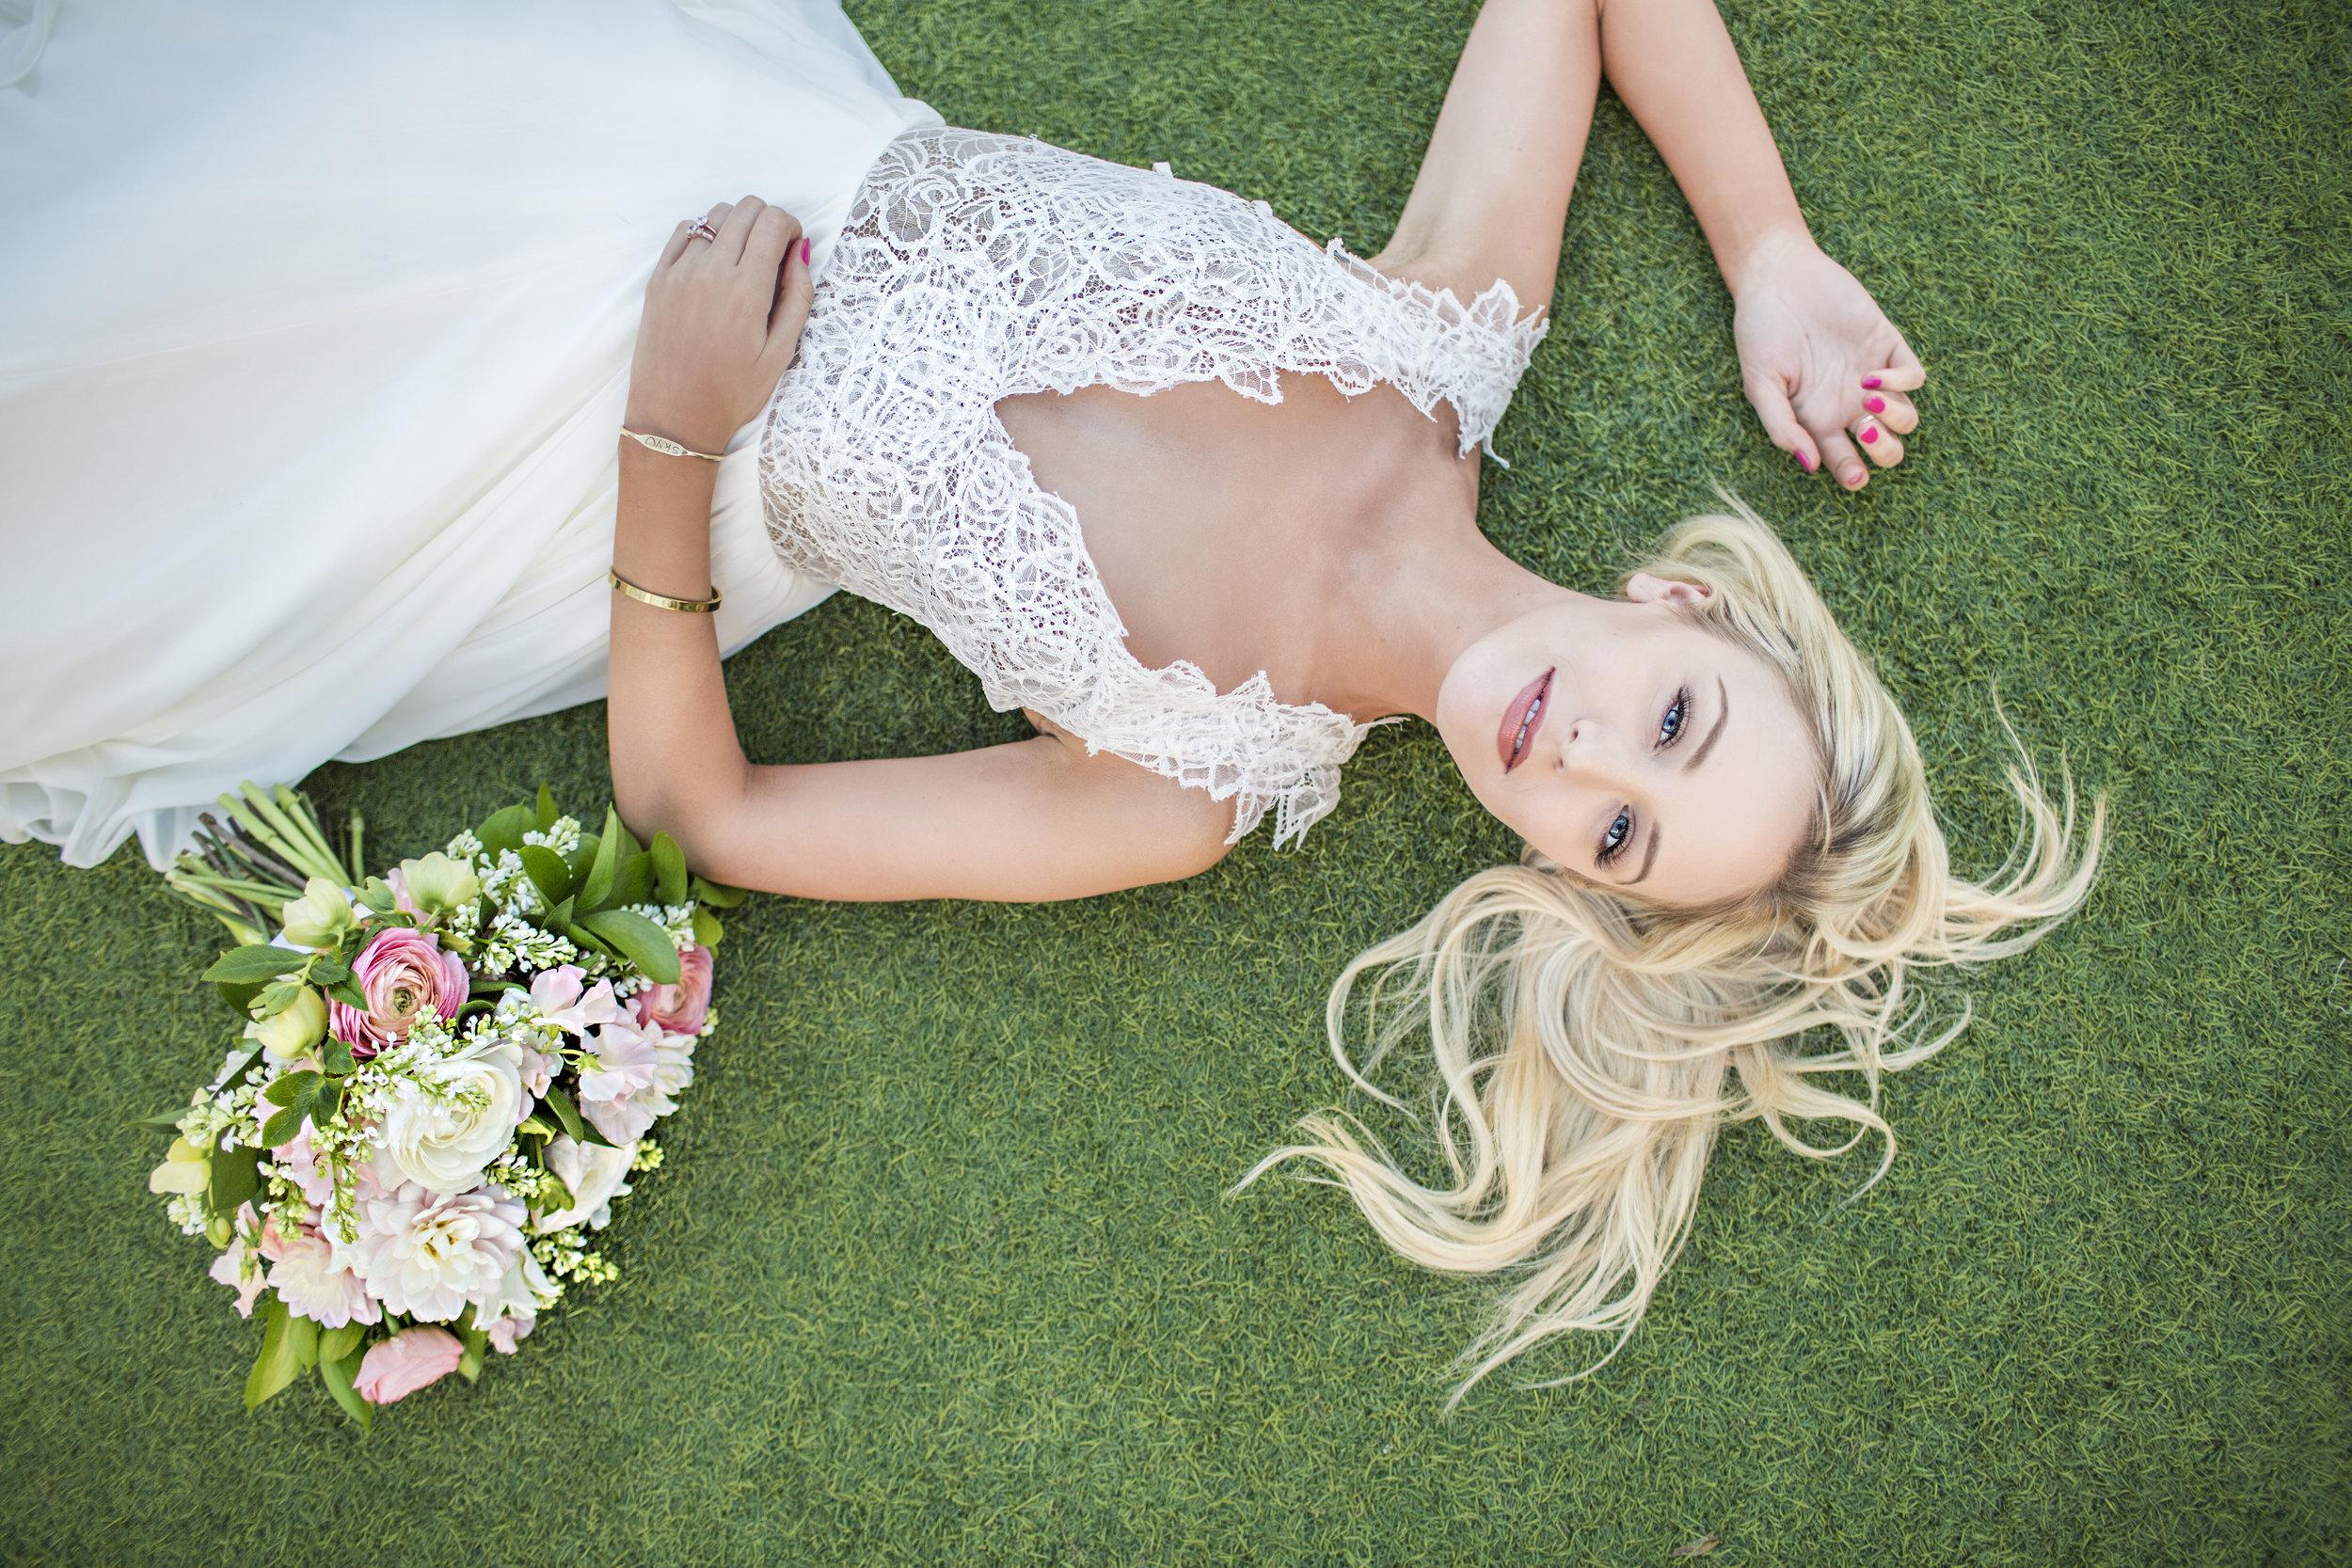 paige-mobley-antm-bridal-benfield-0003.jpg